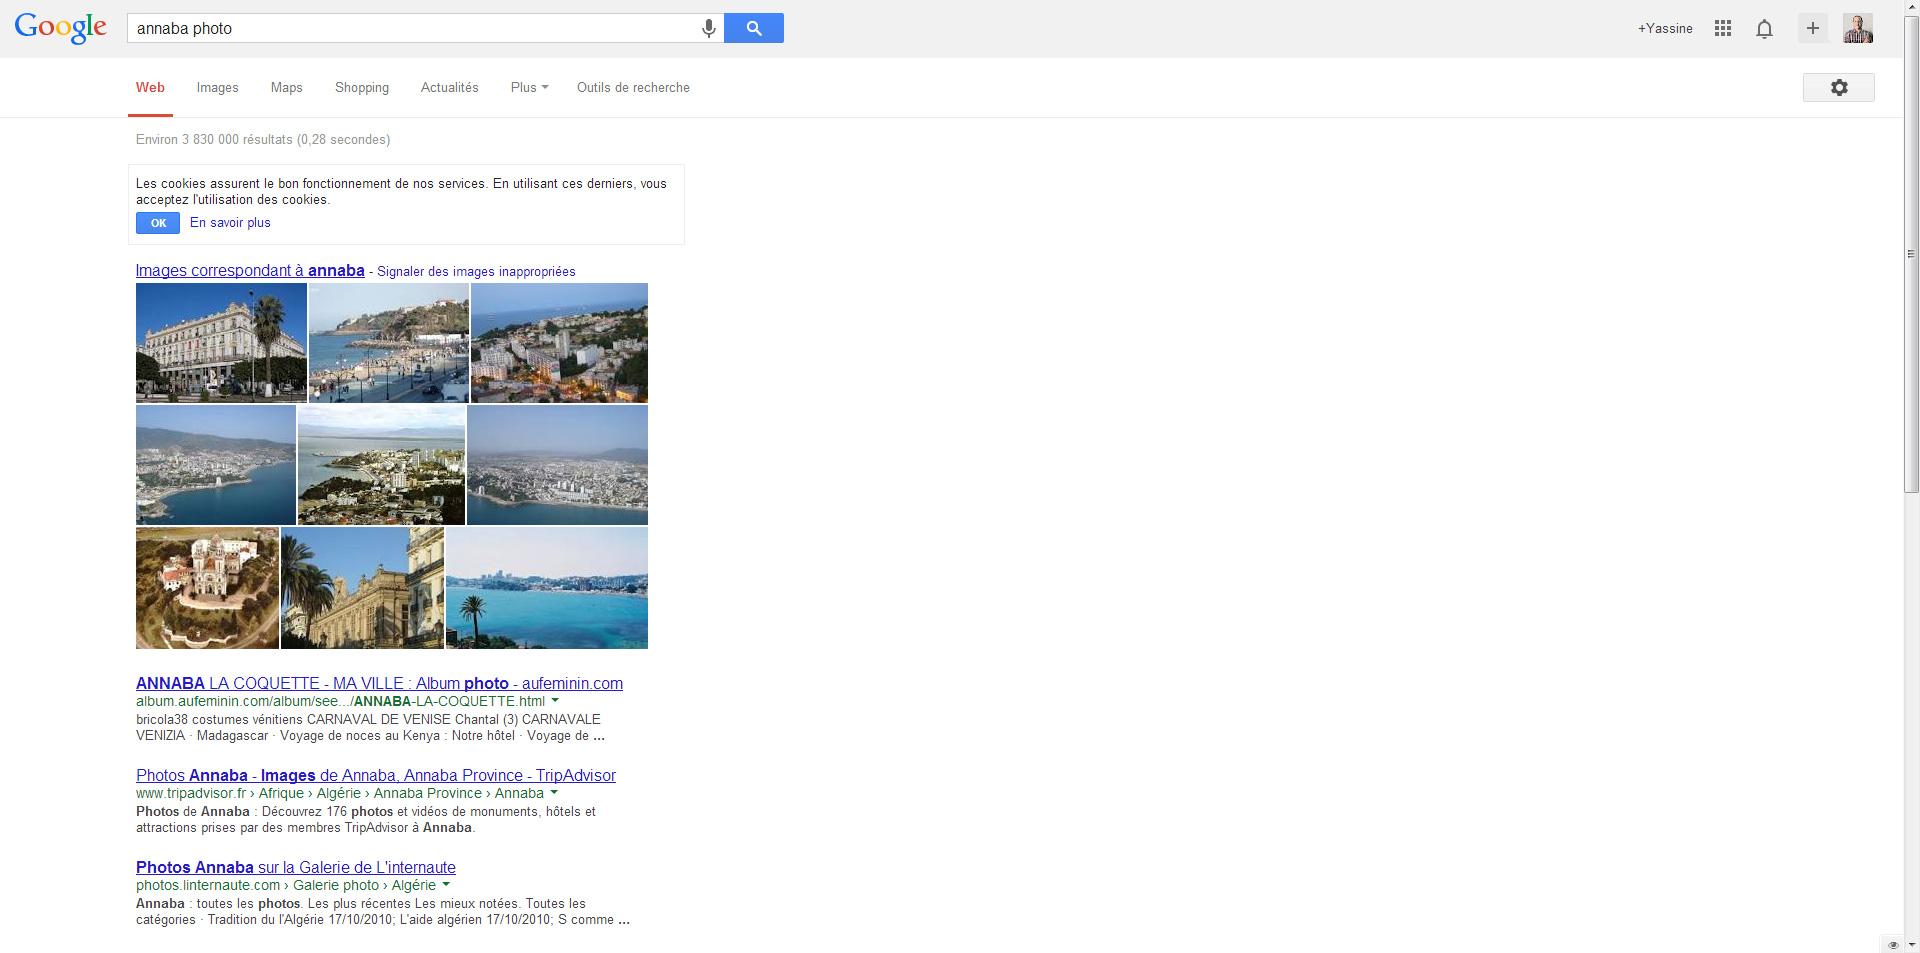 resultats-google-annaba-photo